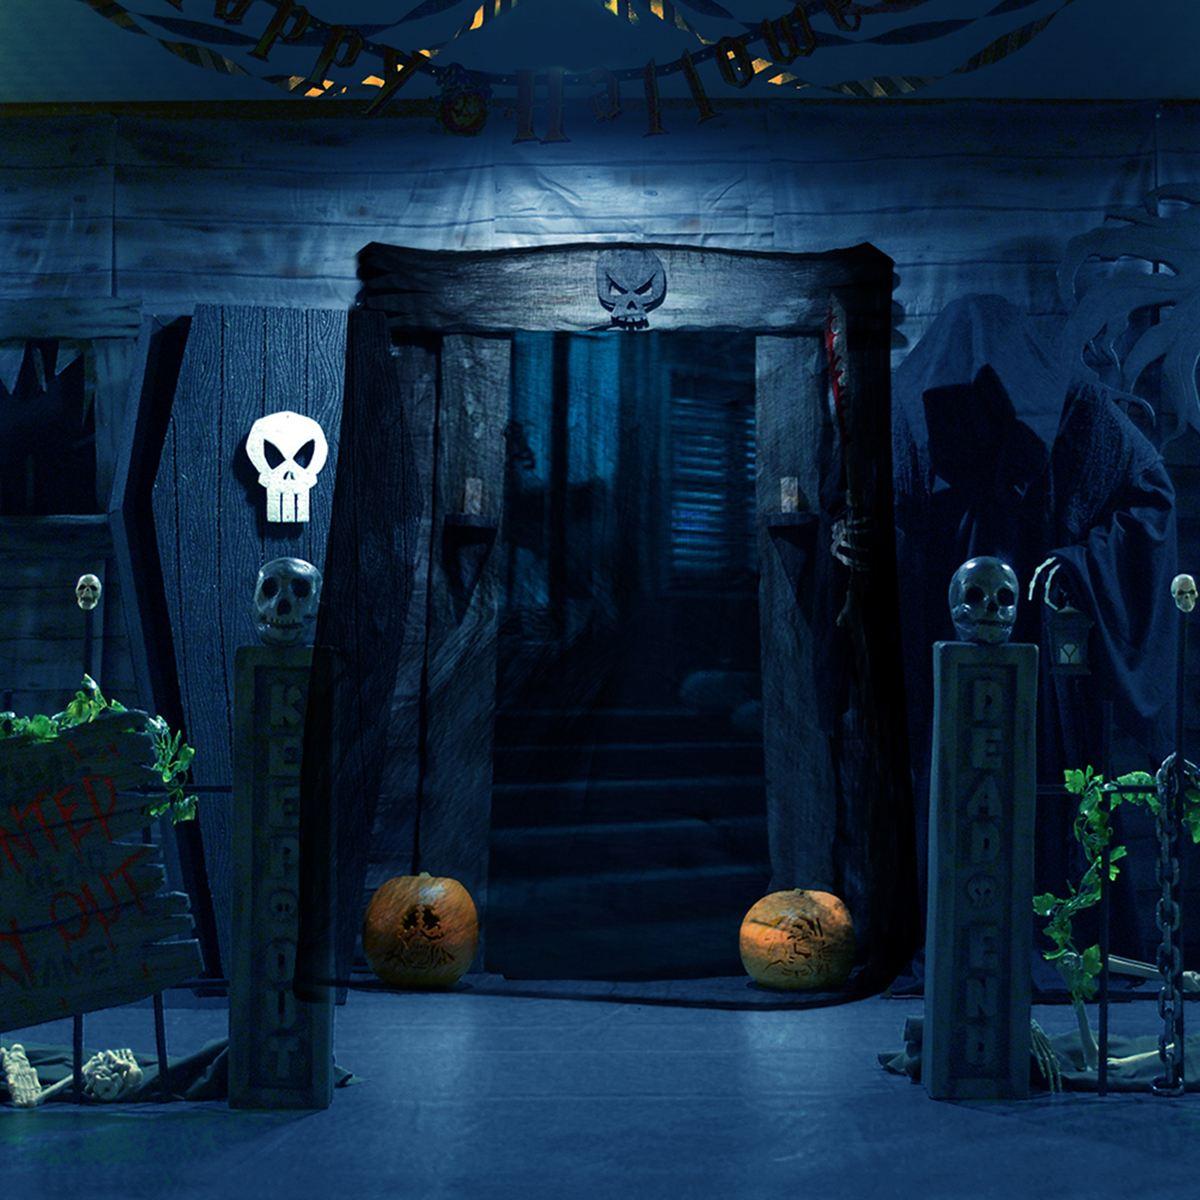 spooky halloween decorations - HD1200×1200